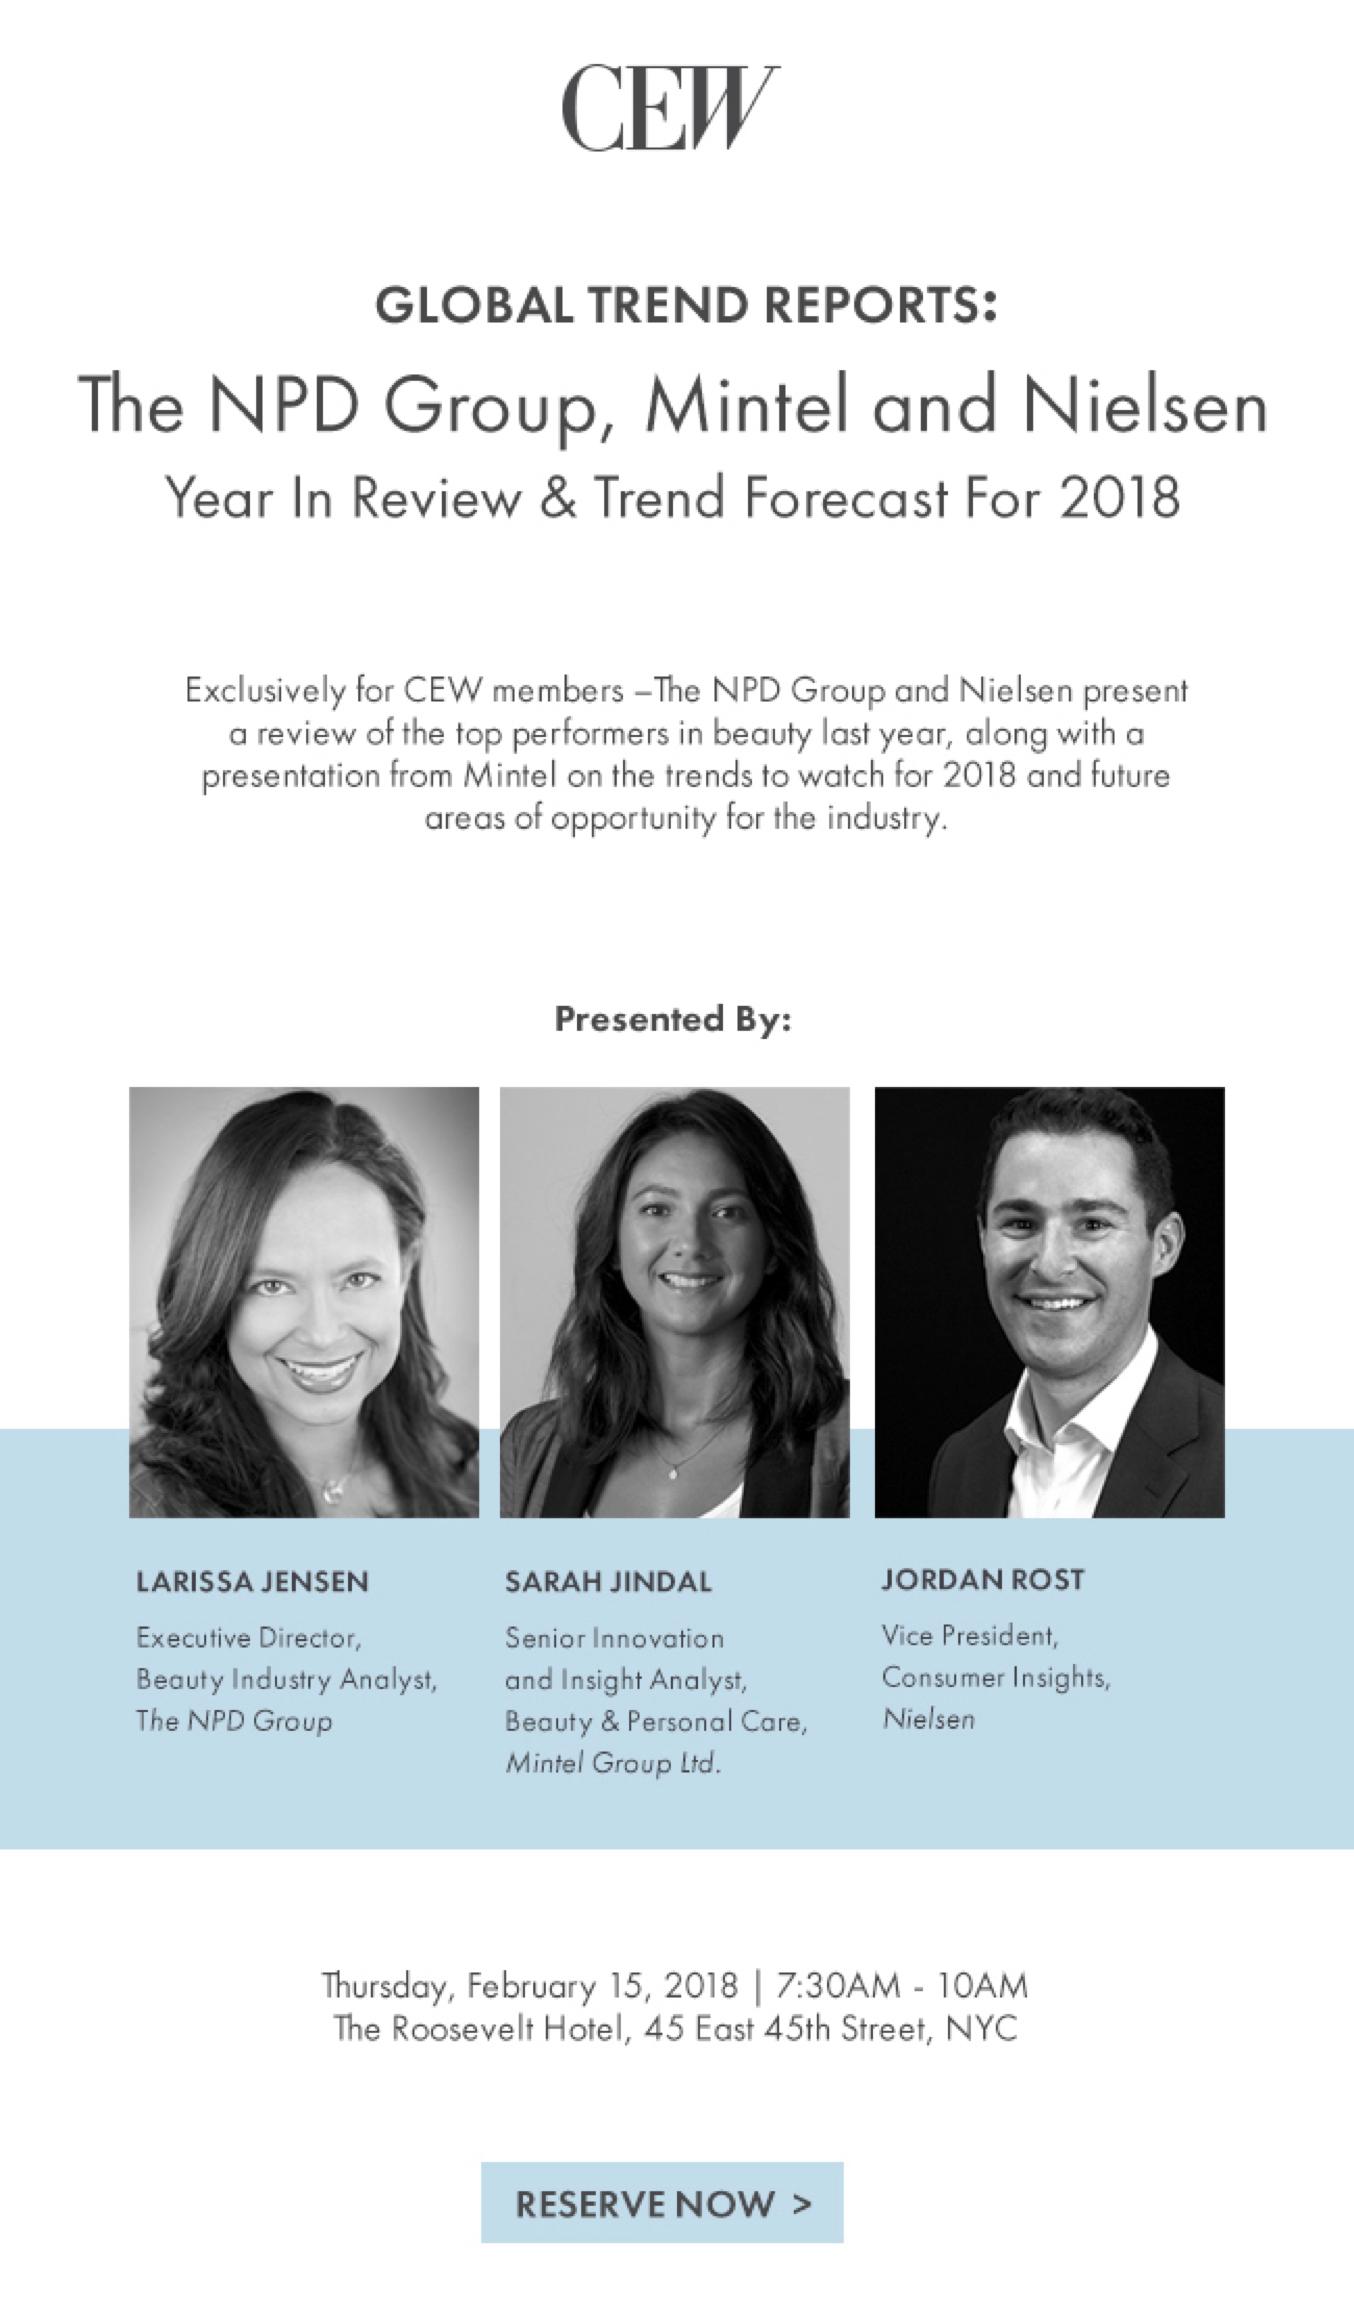 CEW Global Trend Reports 2018.jpg